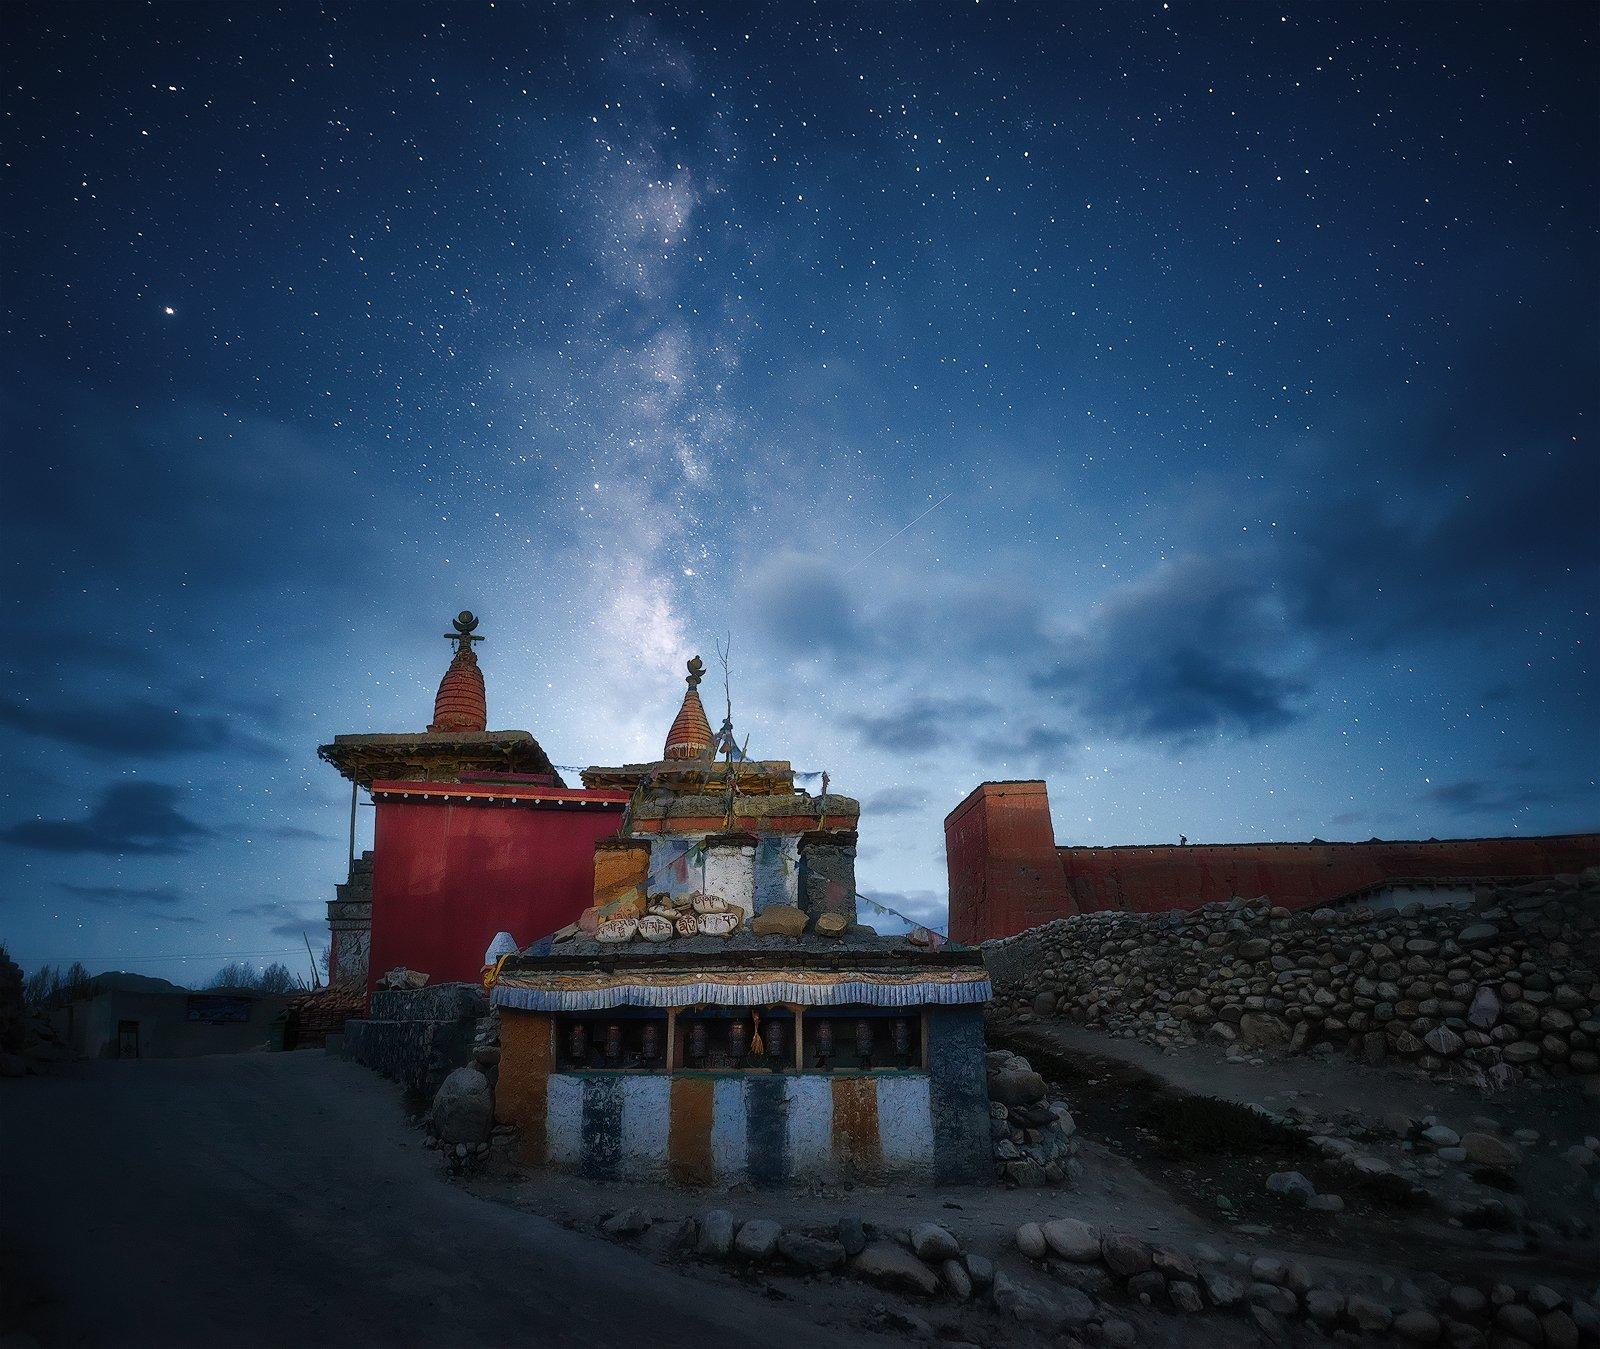 верхний мустанг, непал, nepal, upper mustang, landscape, mountains, milky way, nightsky, Soft Light